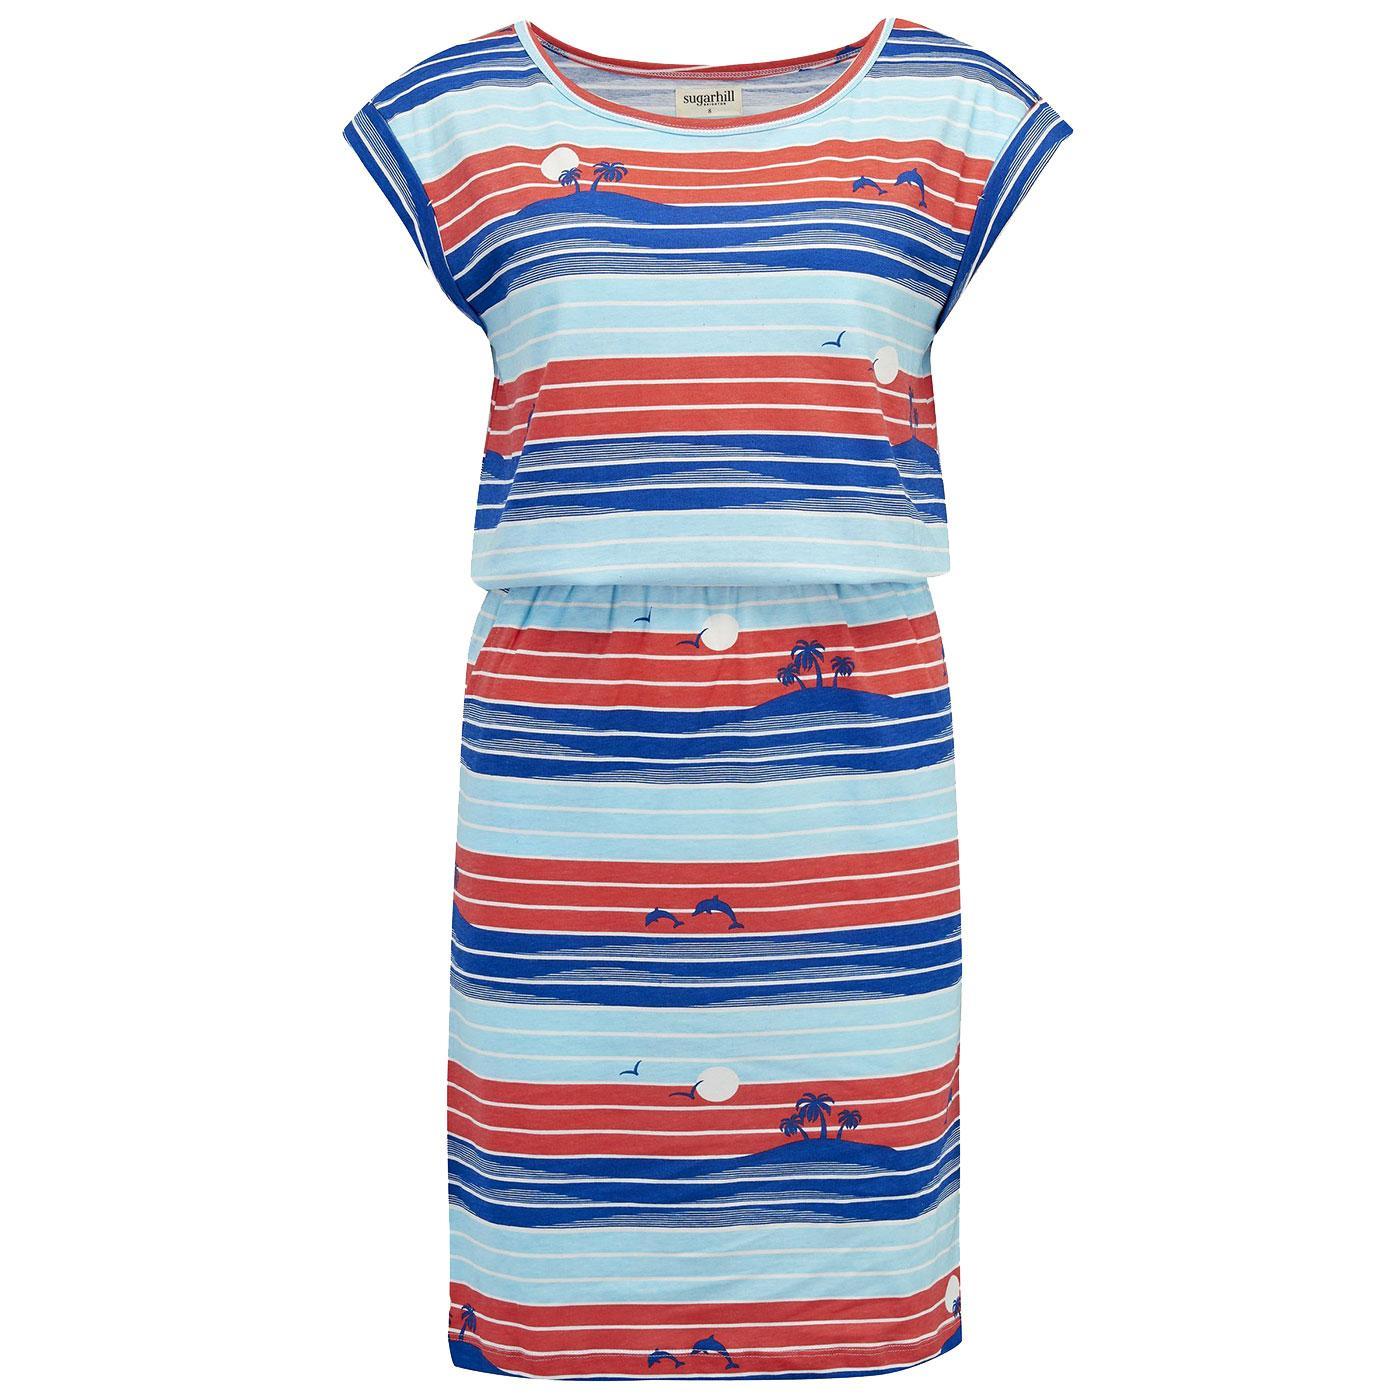 Kate SUGARHILL BRIGHTON Tropical Island Dress